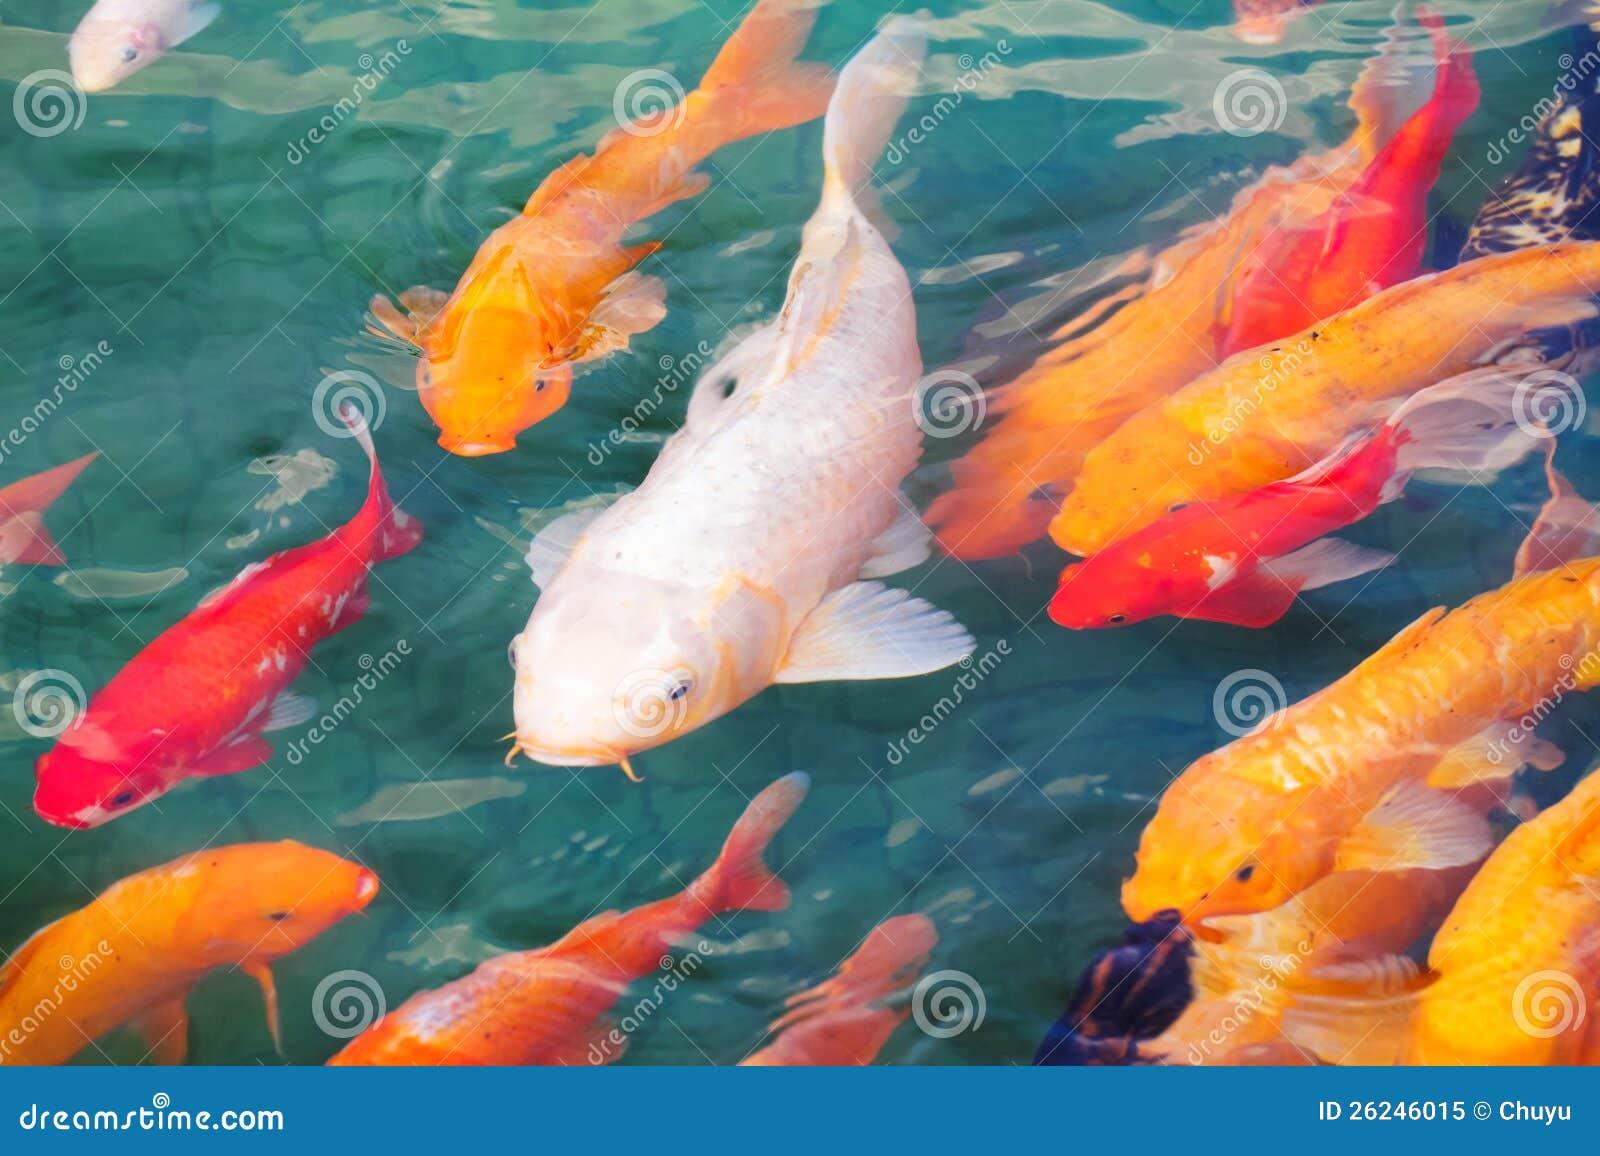 Beautiful koi fish royalty free stock photo image 26246015 for Beautiful koi fish